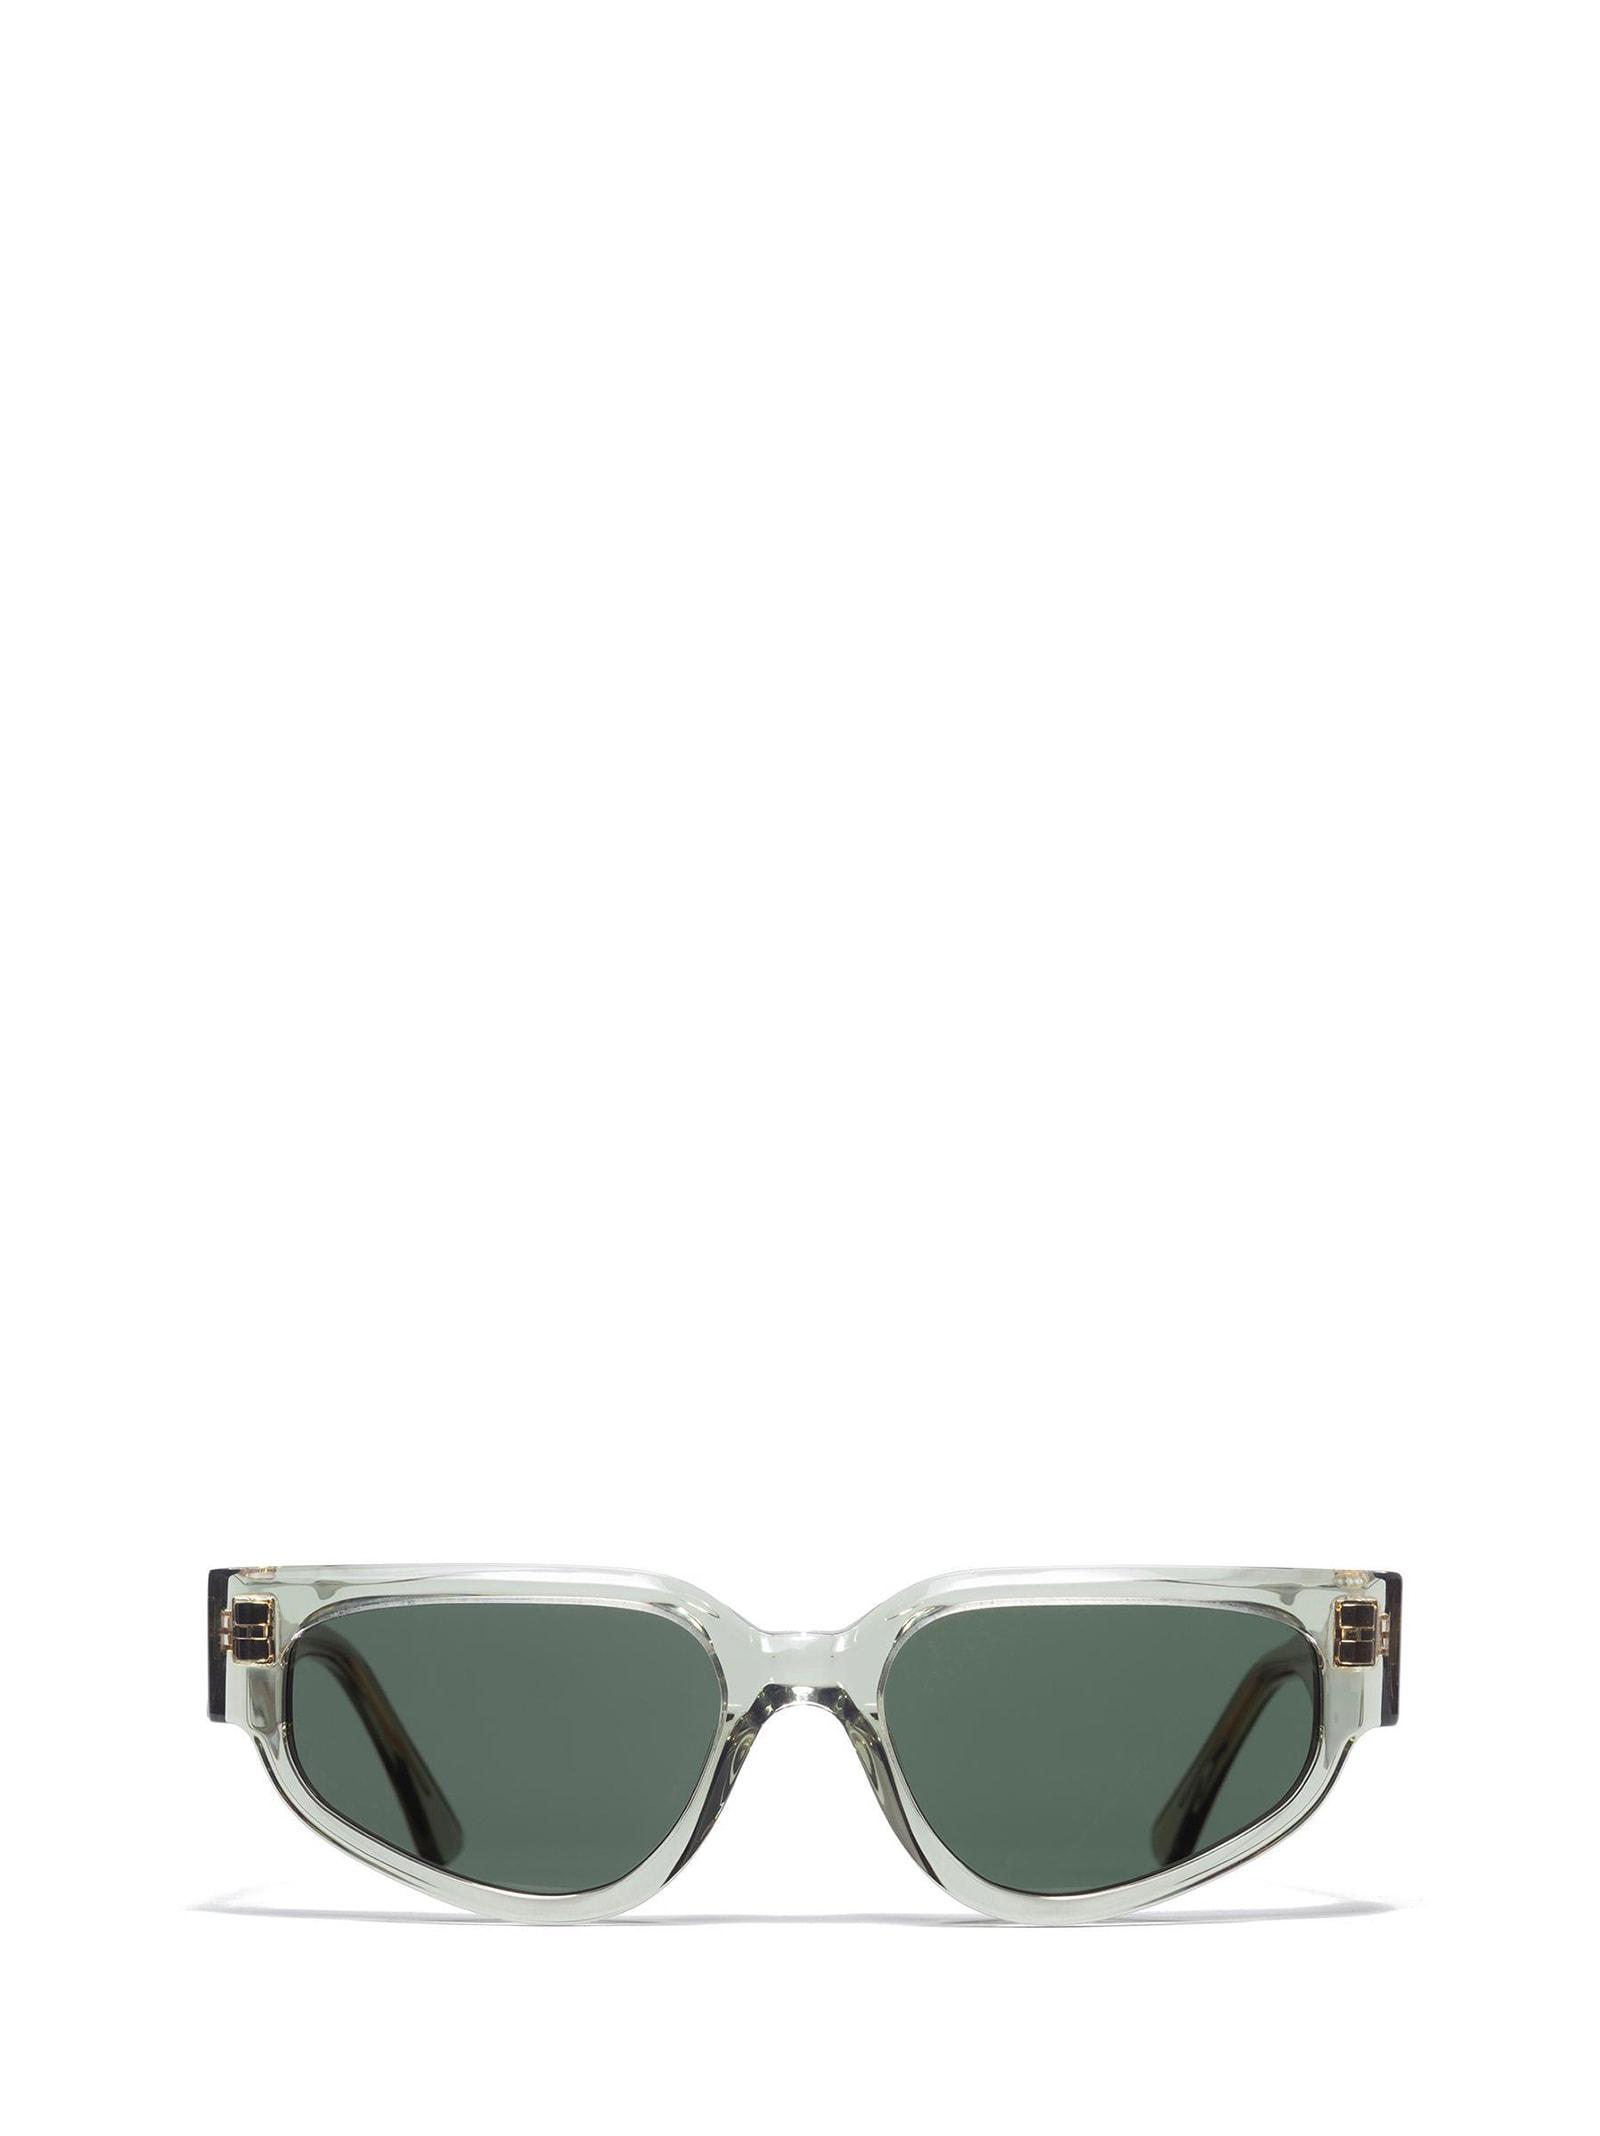 AHLEM Ahlem Passage Lepic Thymelight Sunglasses